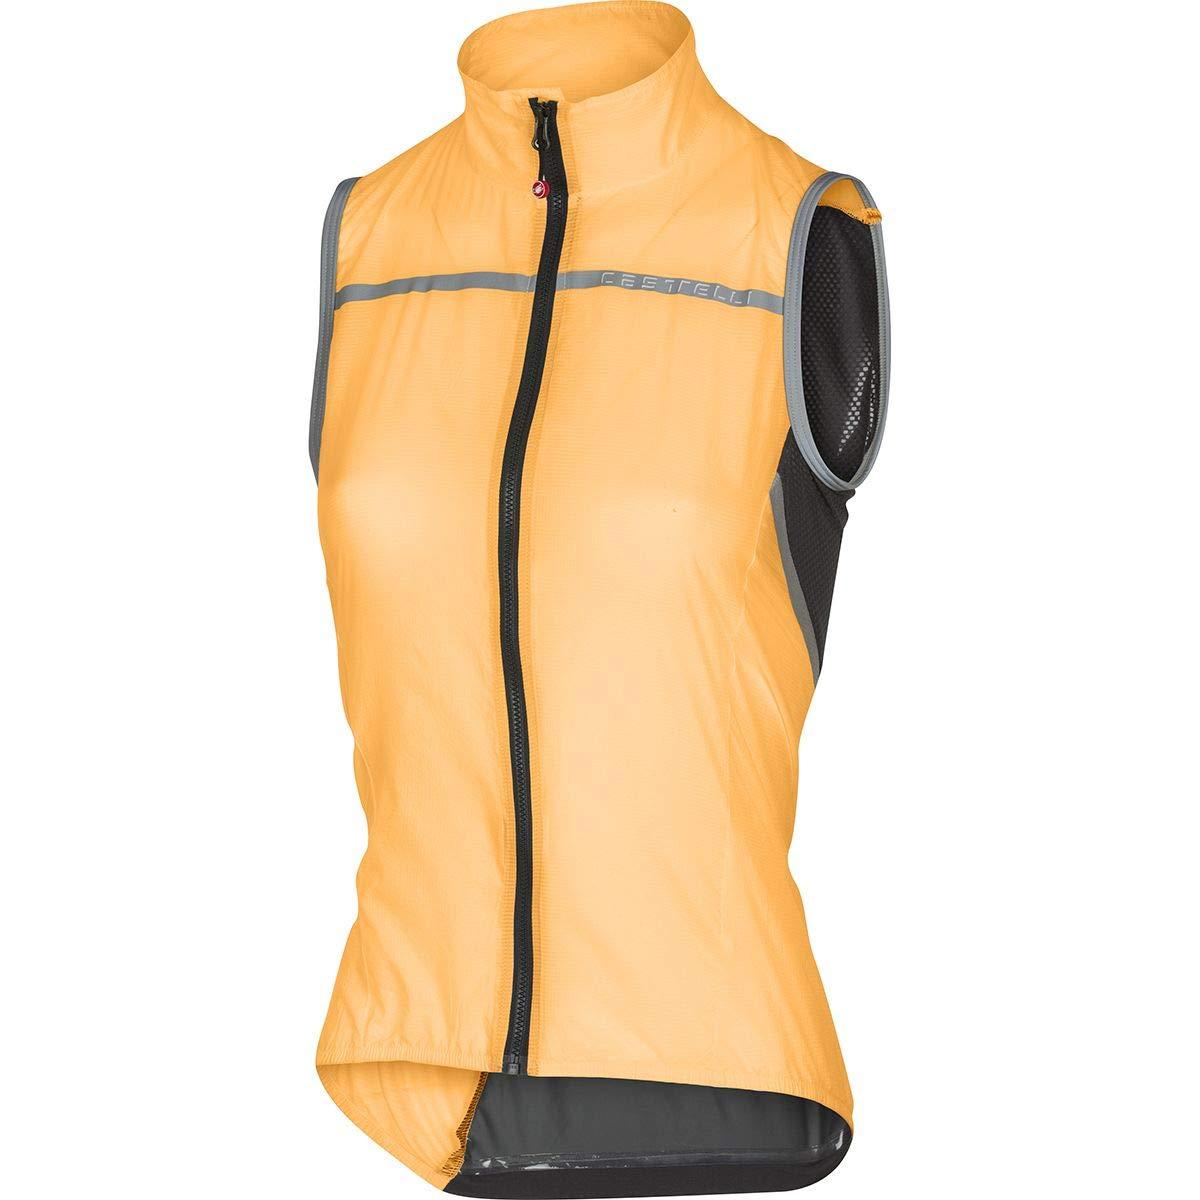 Castelli Superleggera Vest - Women's Orange, S